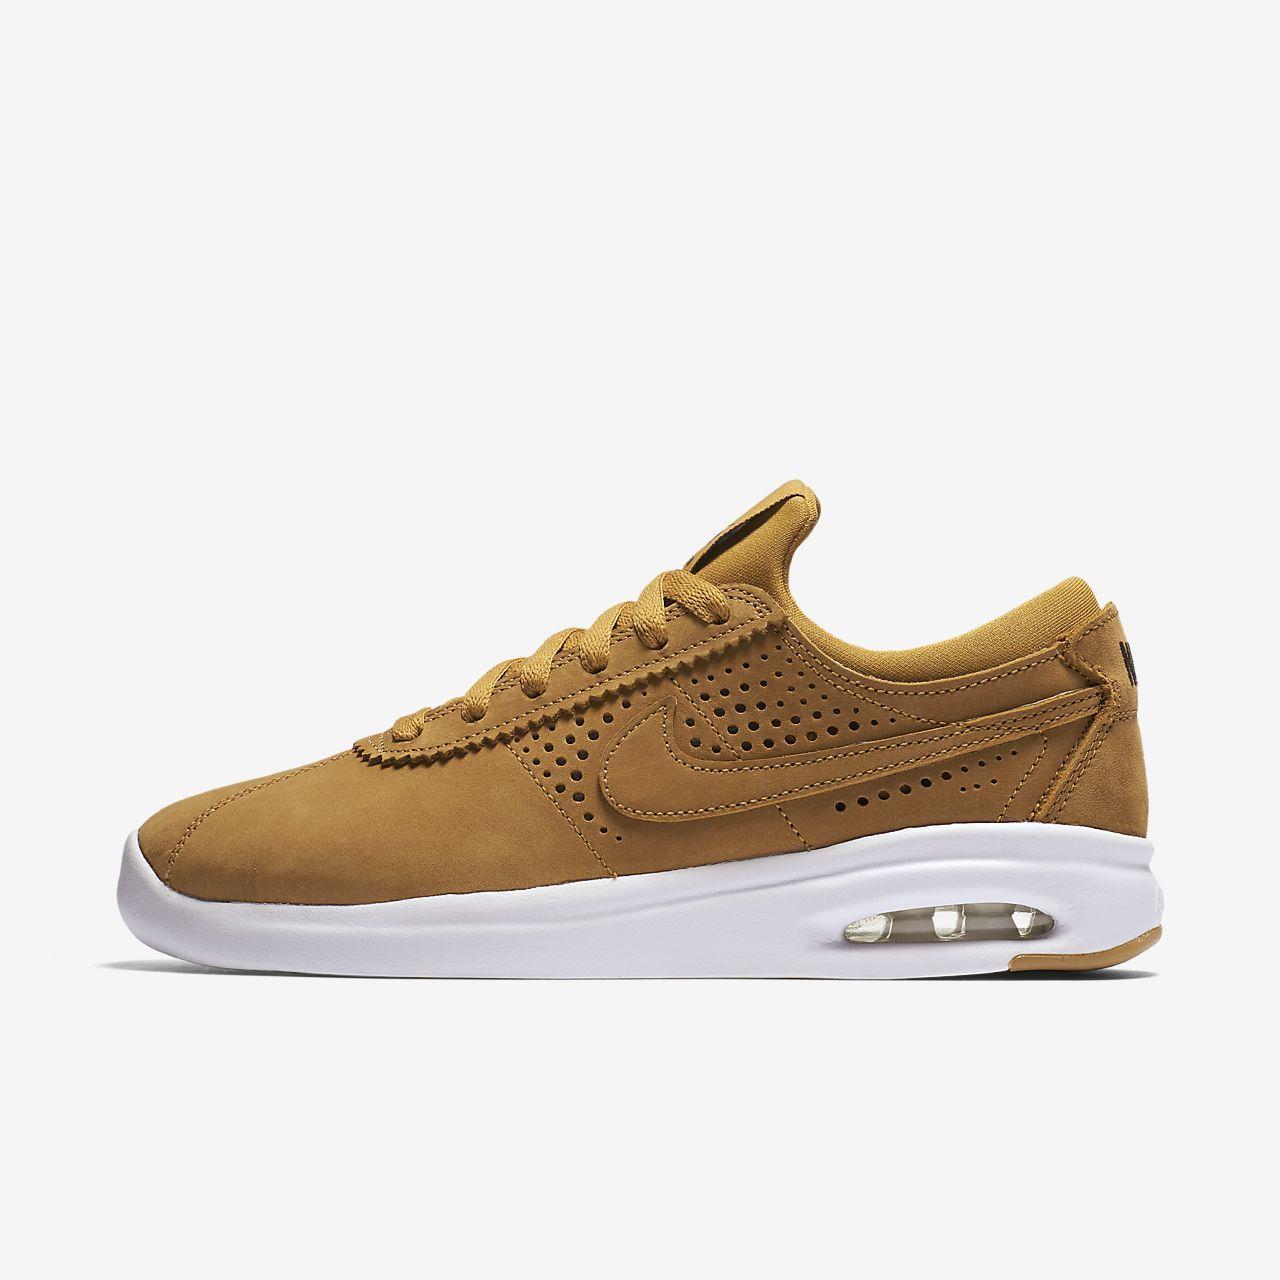 huge discount 86d76 cd634 Nike SB Air Max Bruin Vapor Premium Older Kids  Skateboarding Shoe